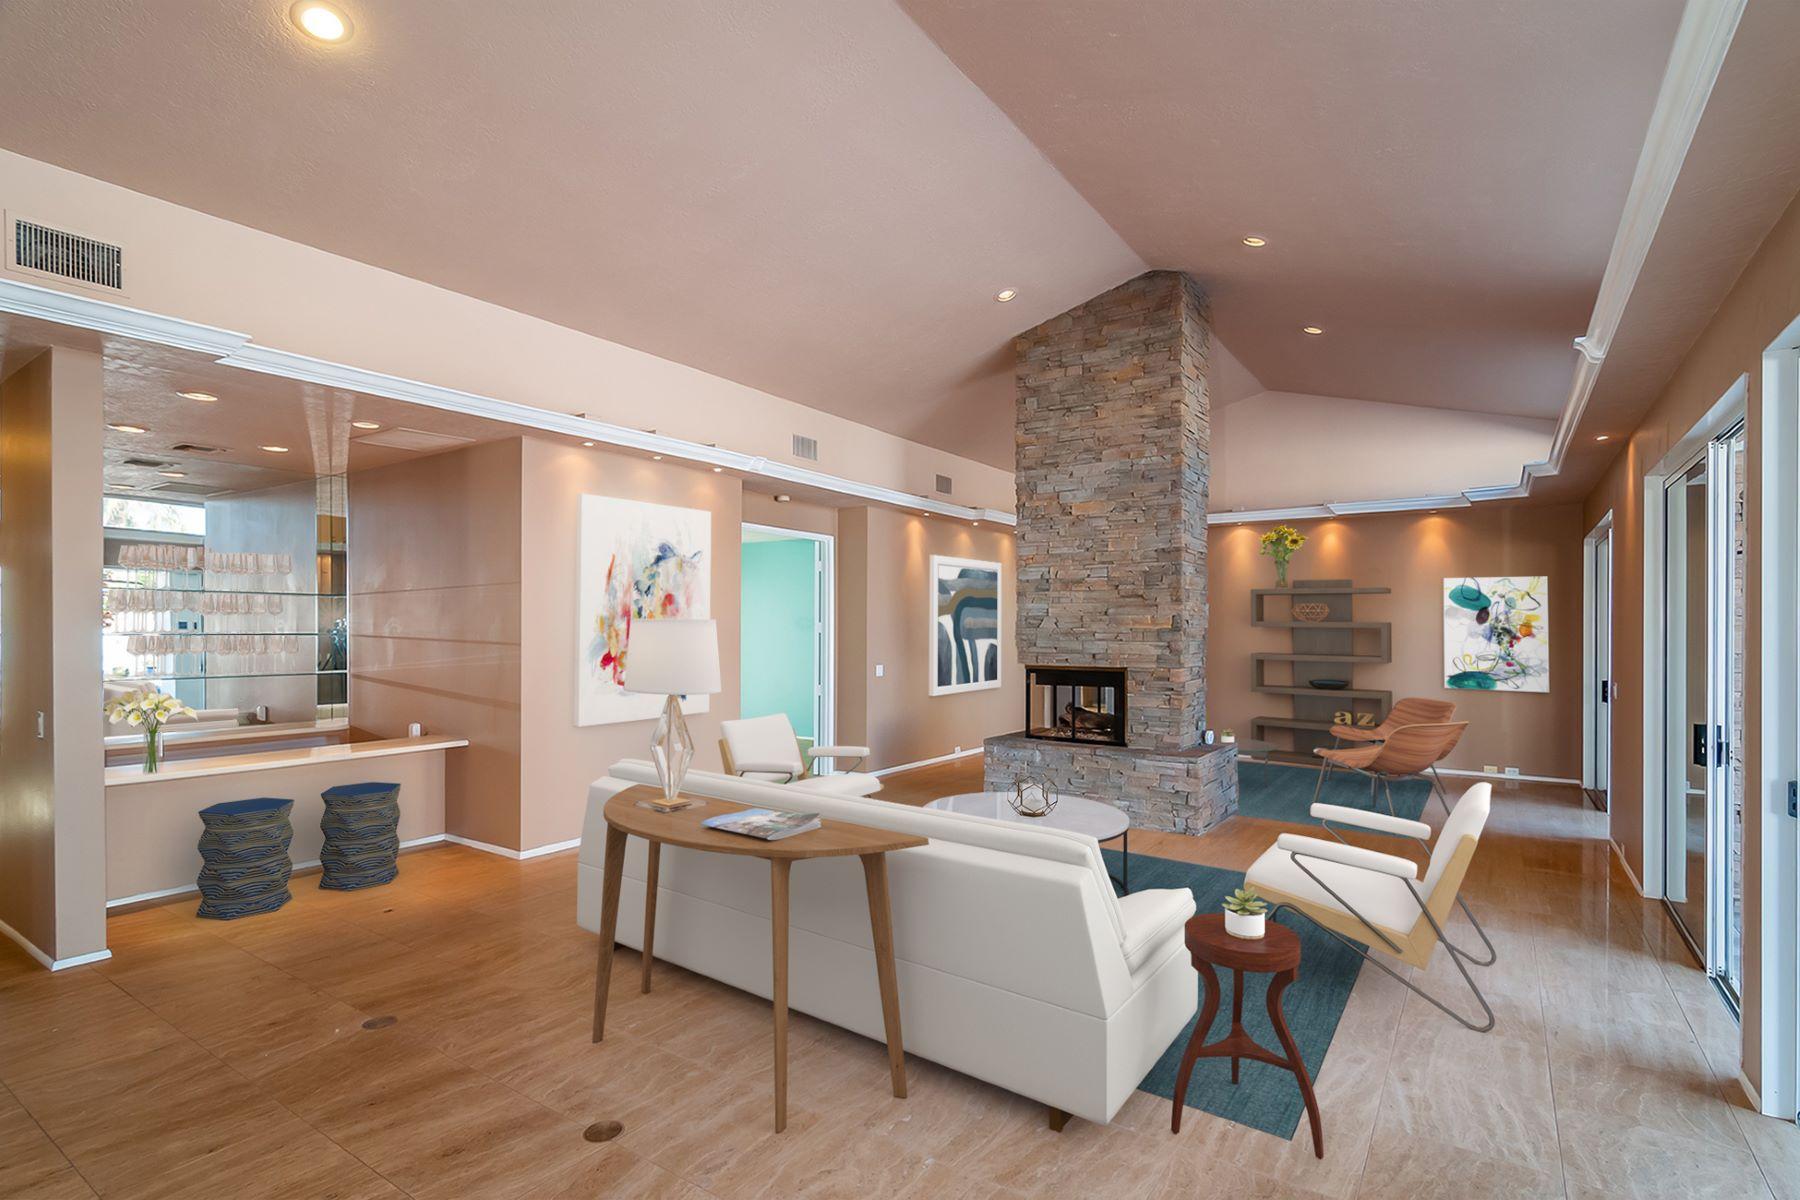 Single Family Homes for Sale at 72591 Sun Valley Lane Palm Desert, California 92260 United States